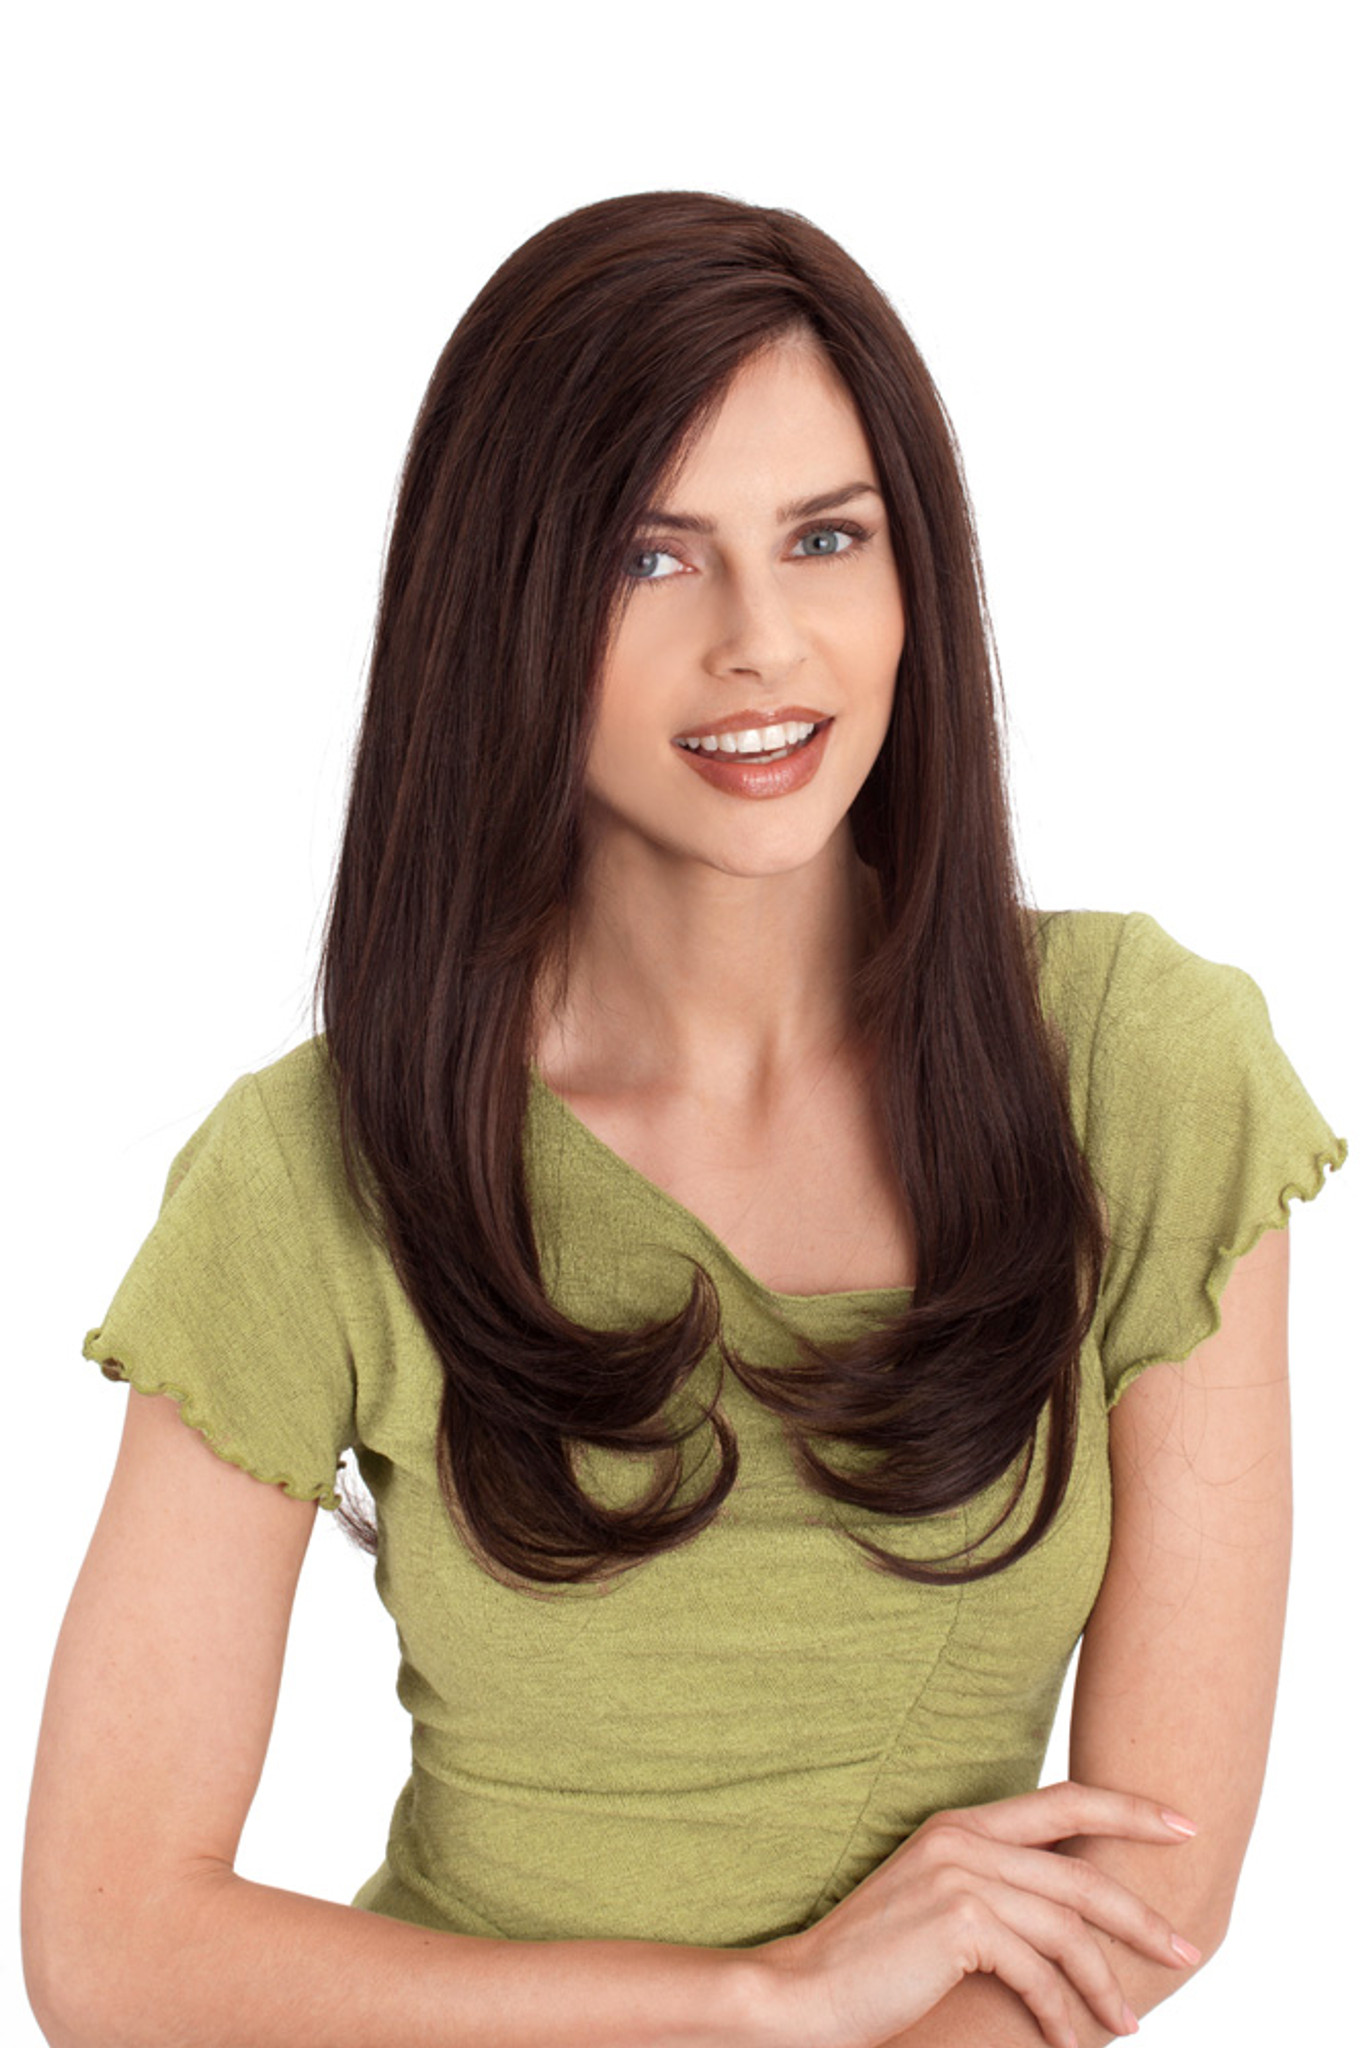 Louis Ferre Diamond  Monotop Human Hair Wig Front View